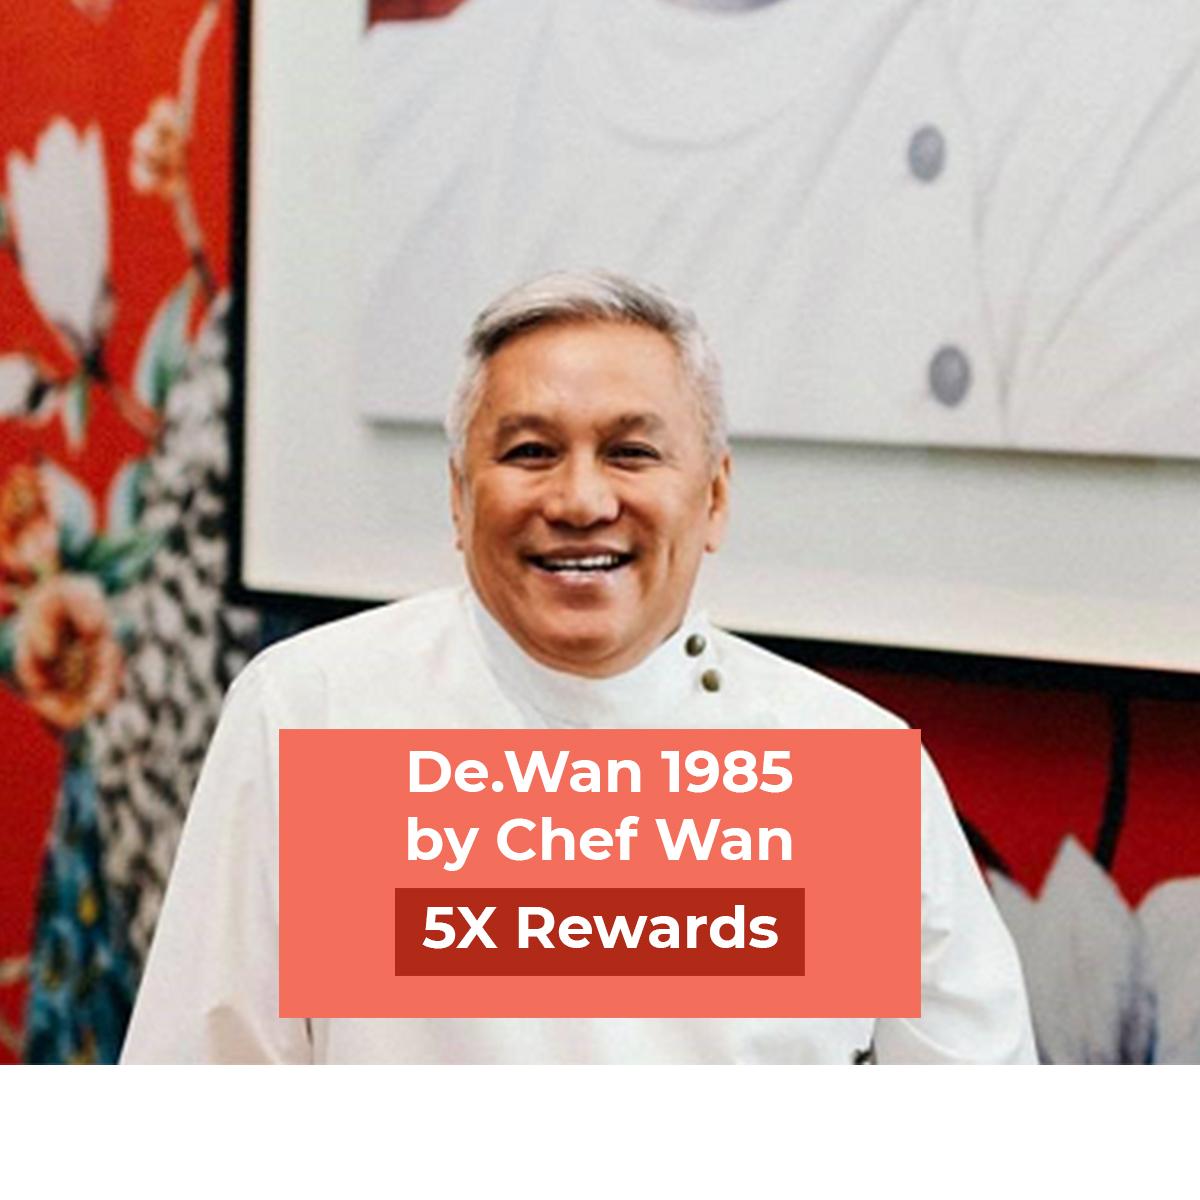 De.Wan-2